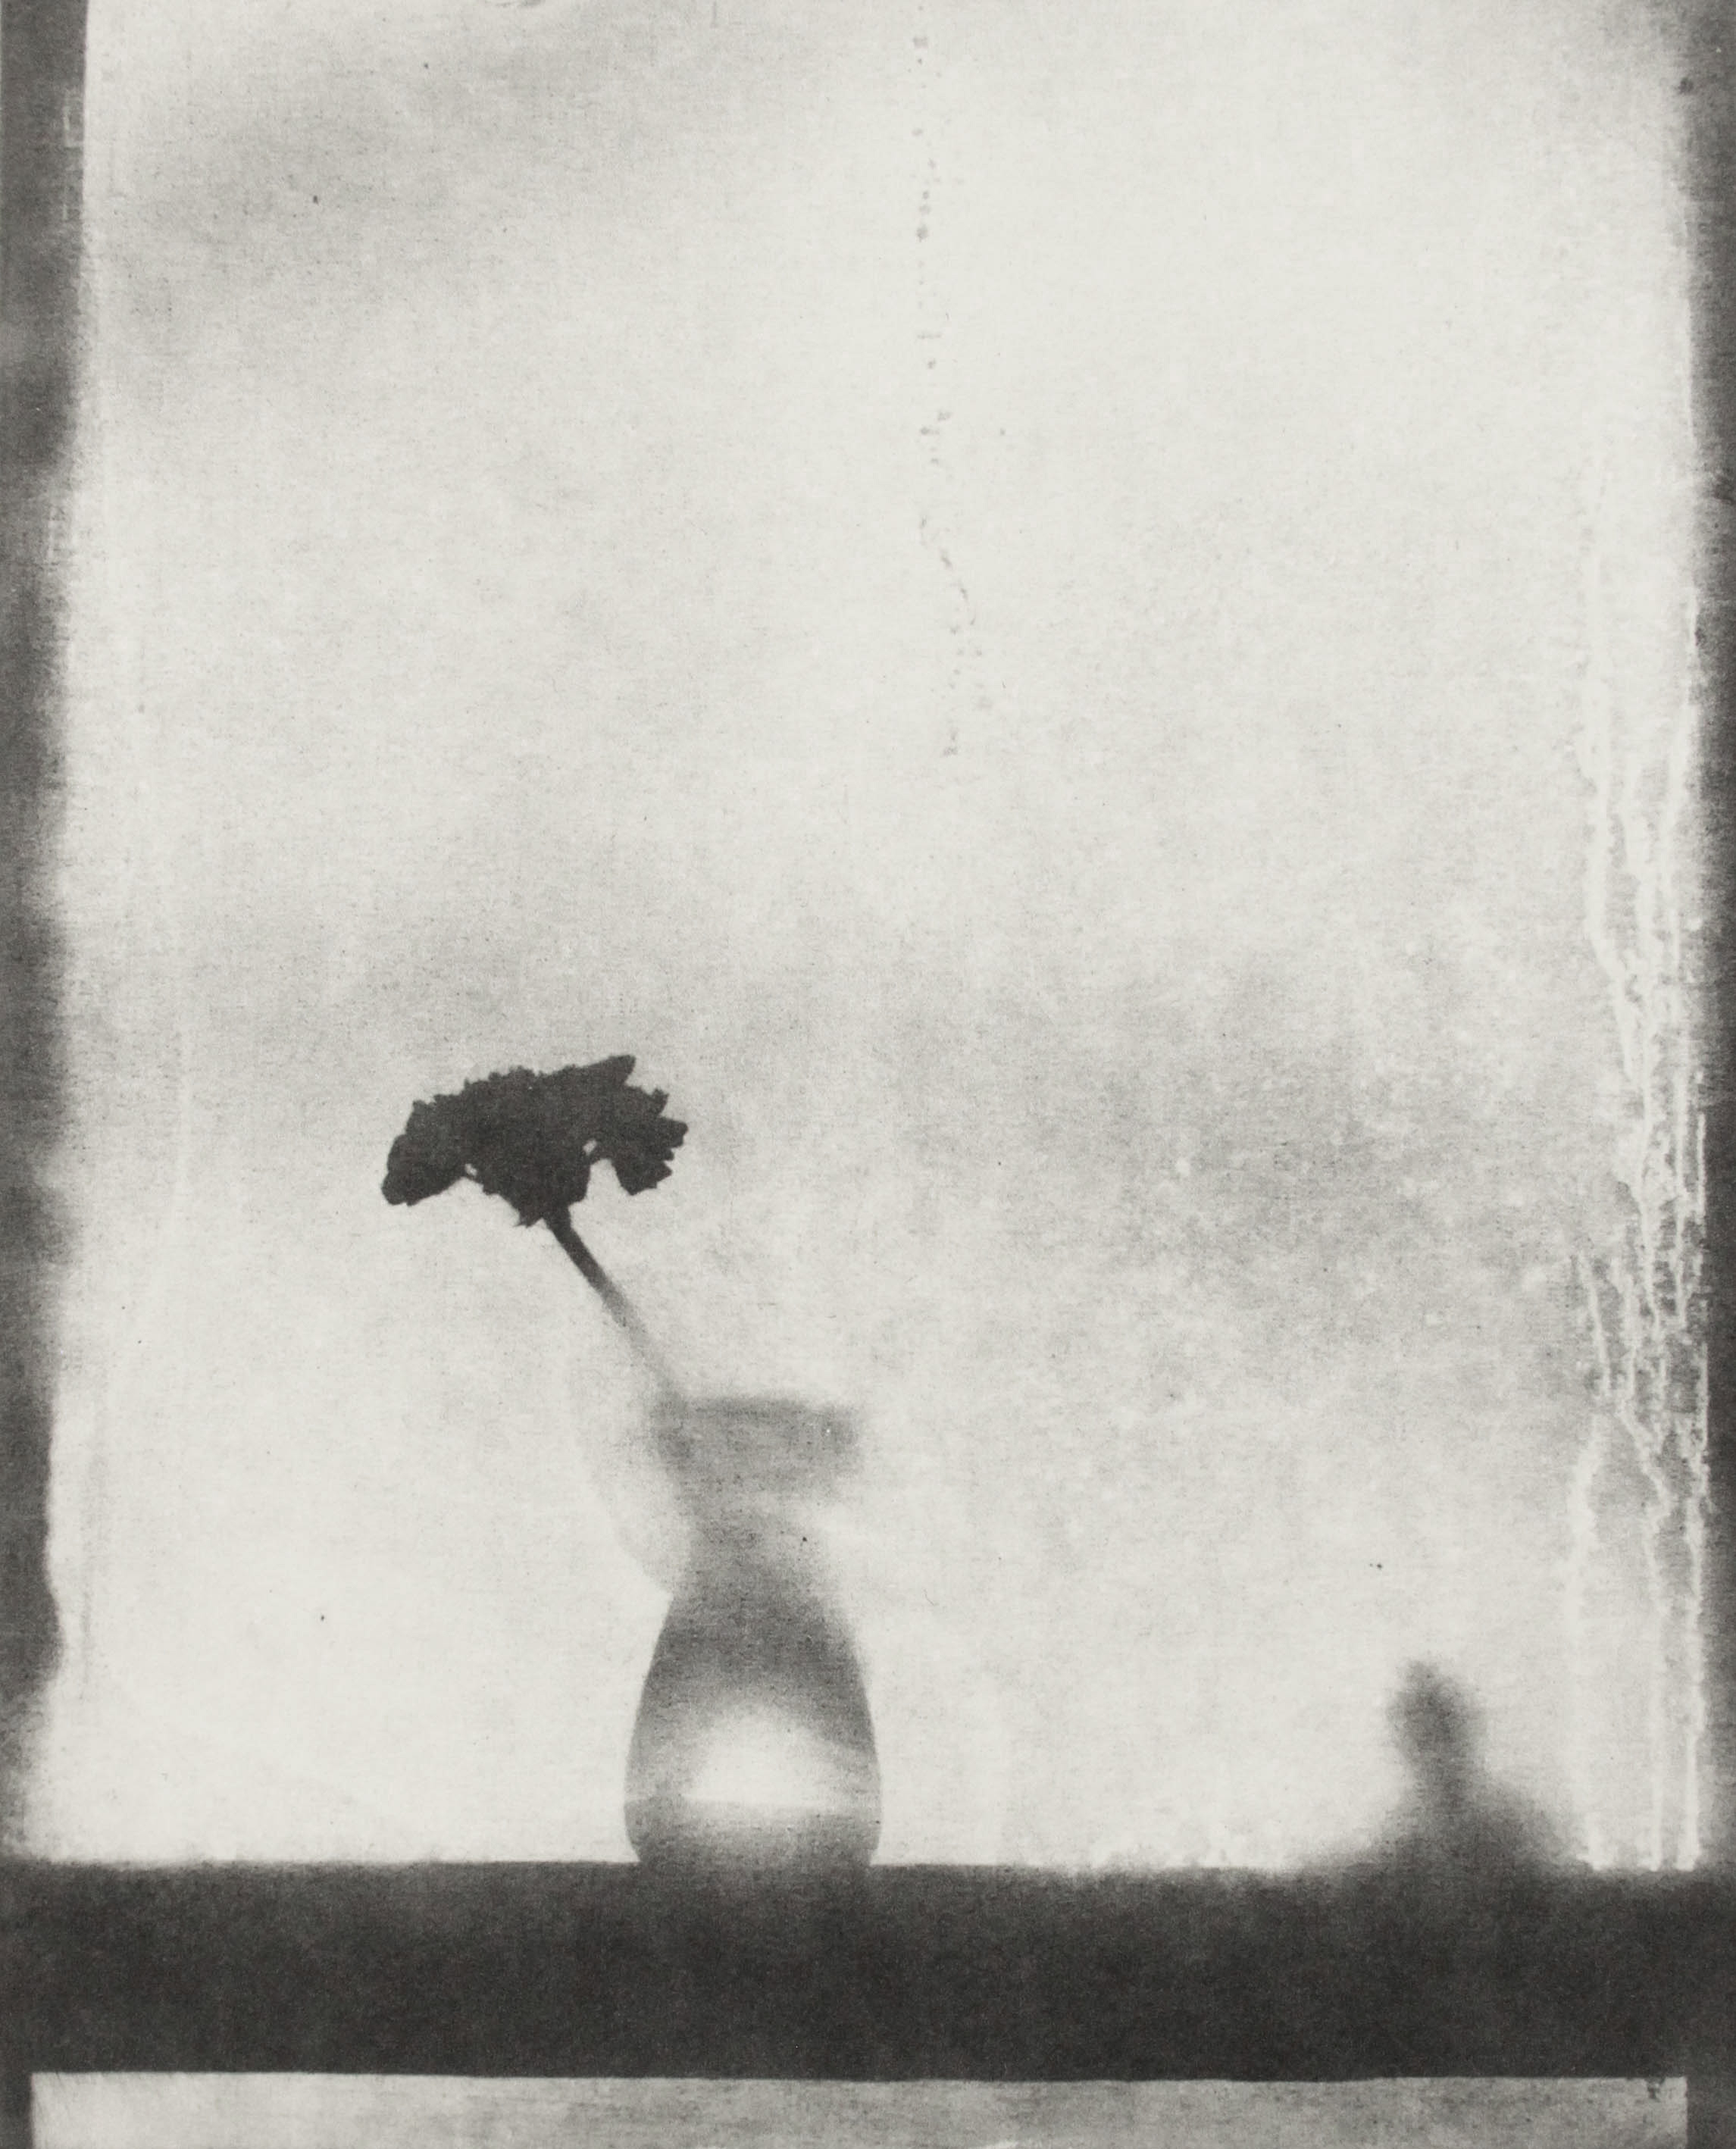 Lucy Bainbridge, Waiting for Spring, 2021